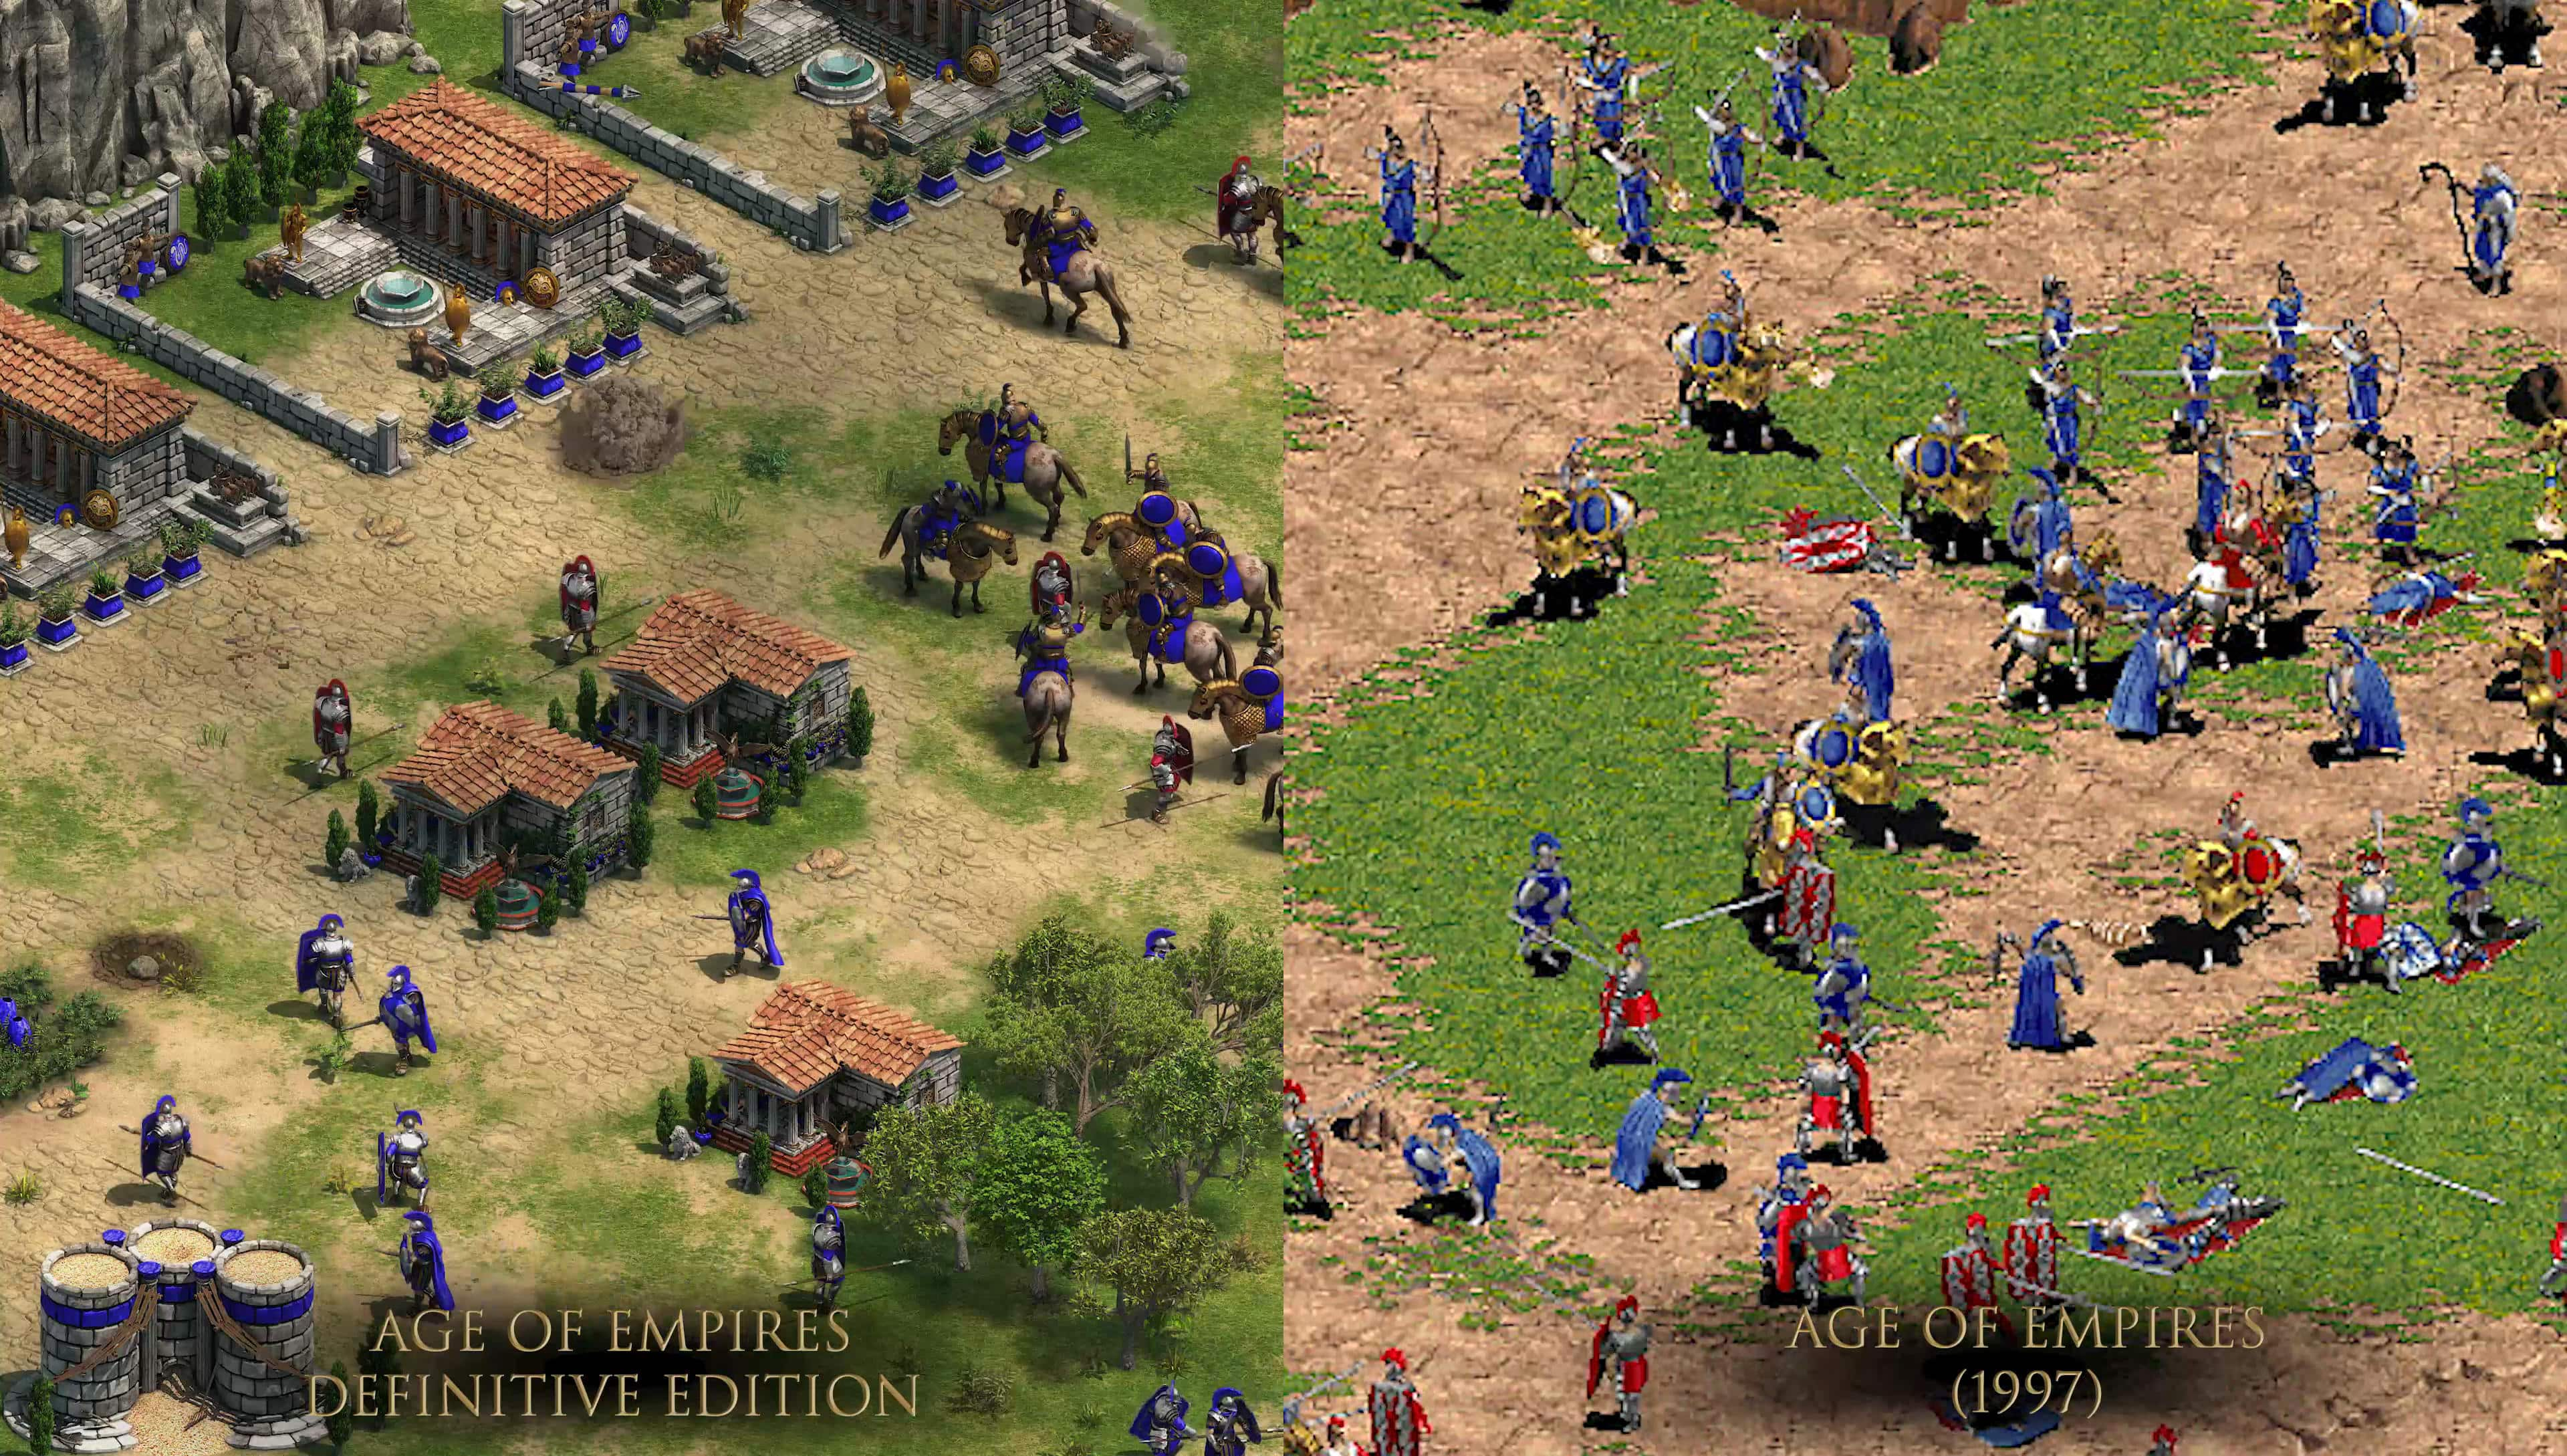 Age of Empires: Definitive Edition comparison shot vis original